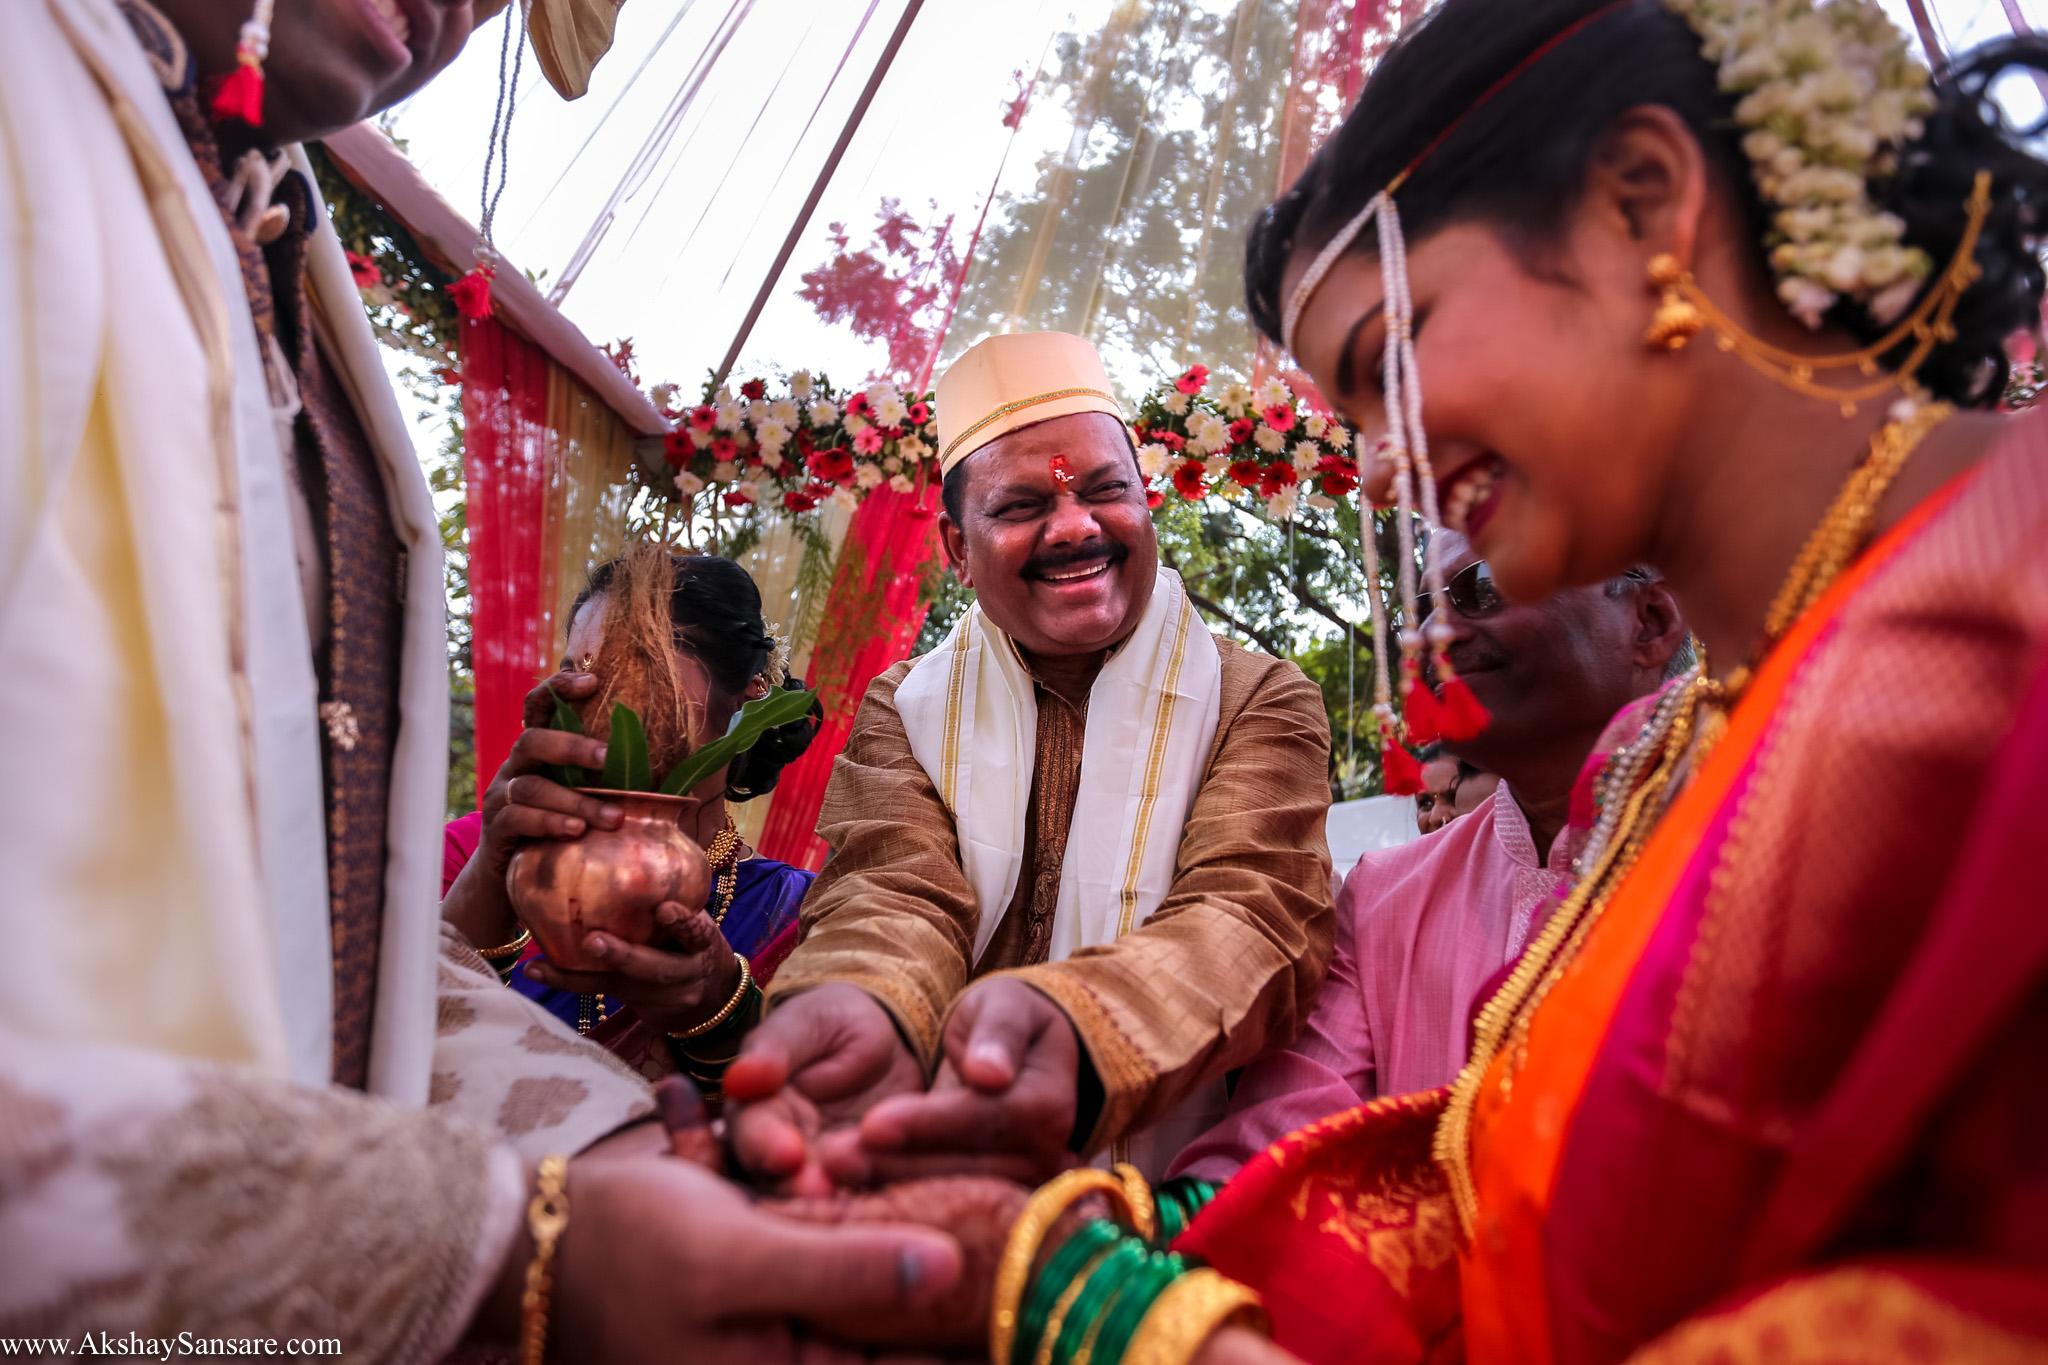 Salil x Kimaya Akshay Sansare Photography Candid wedding Photographer in mumbai best(20).jpg